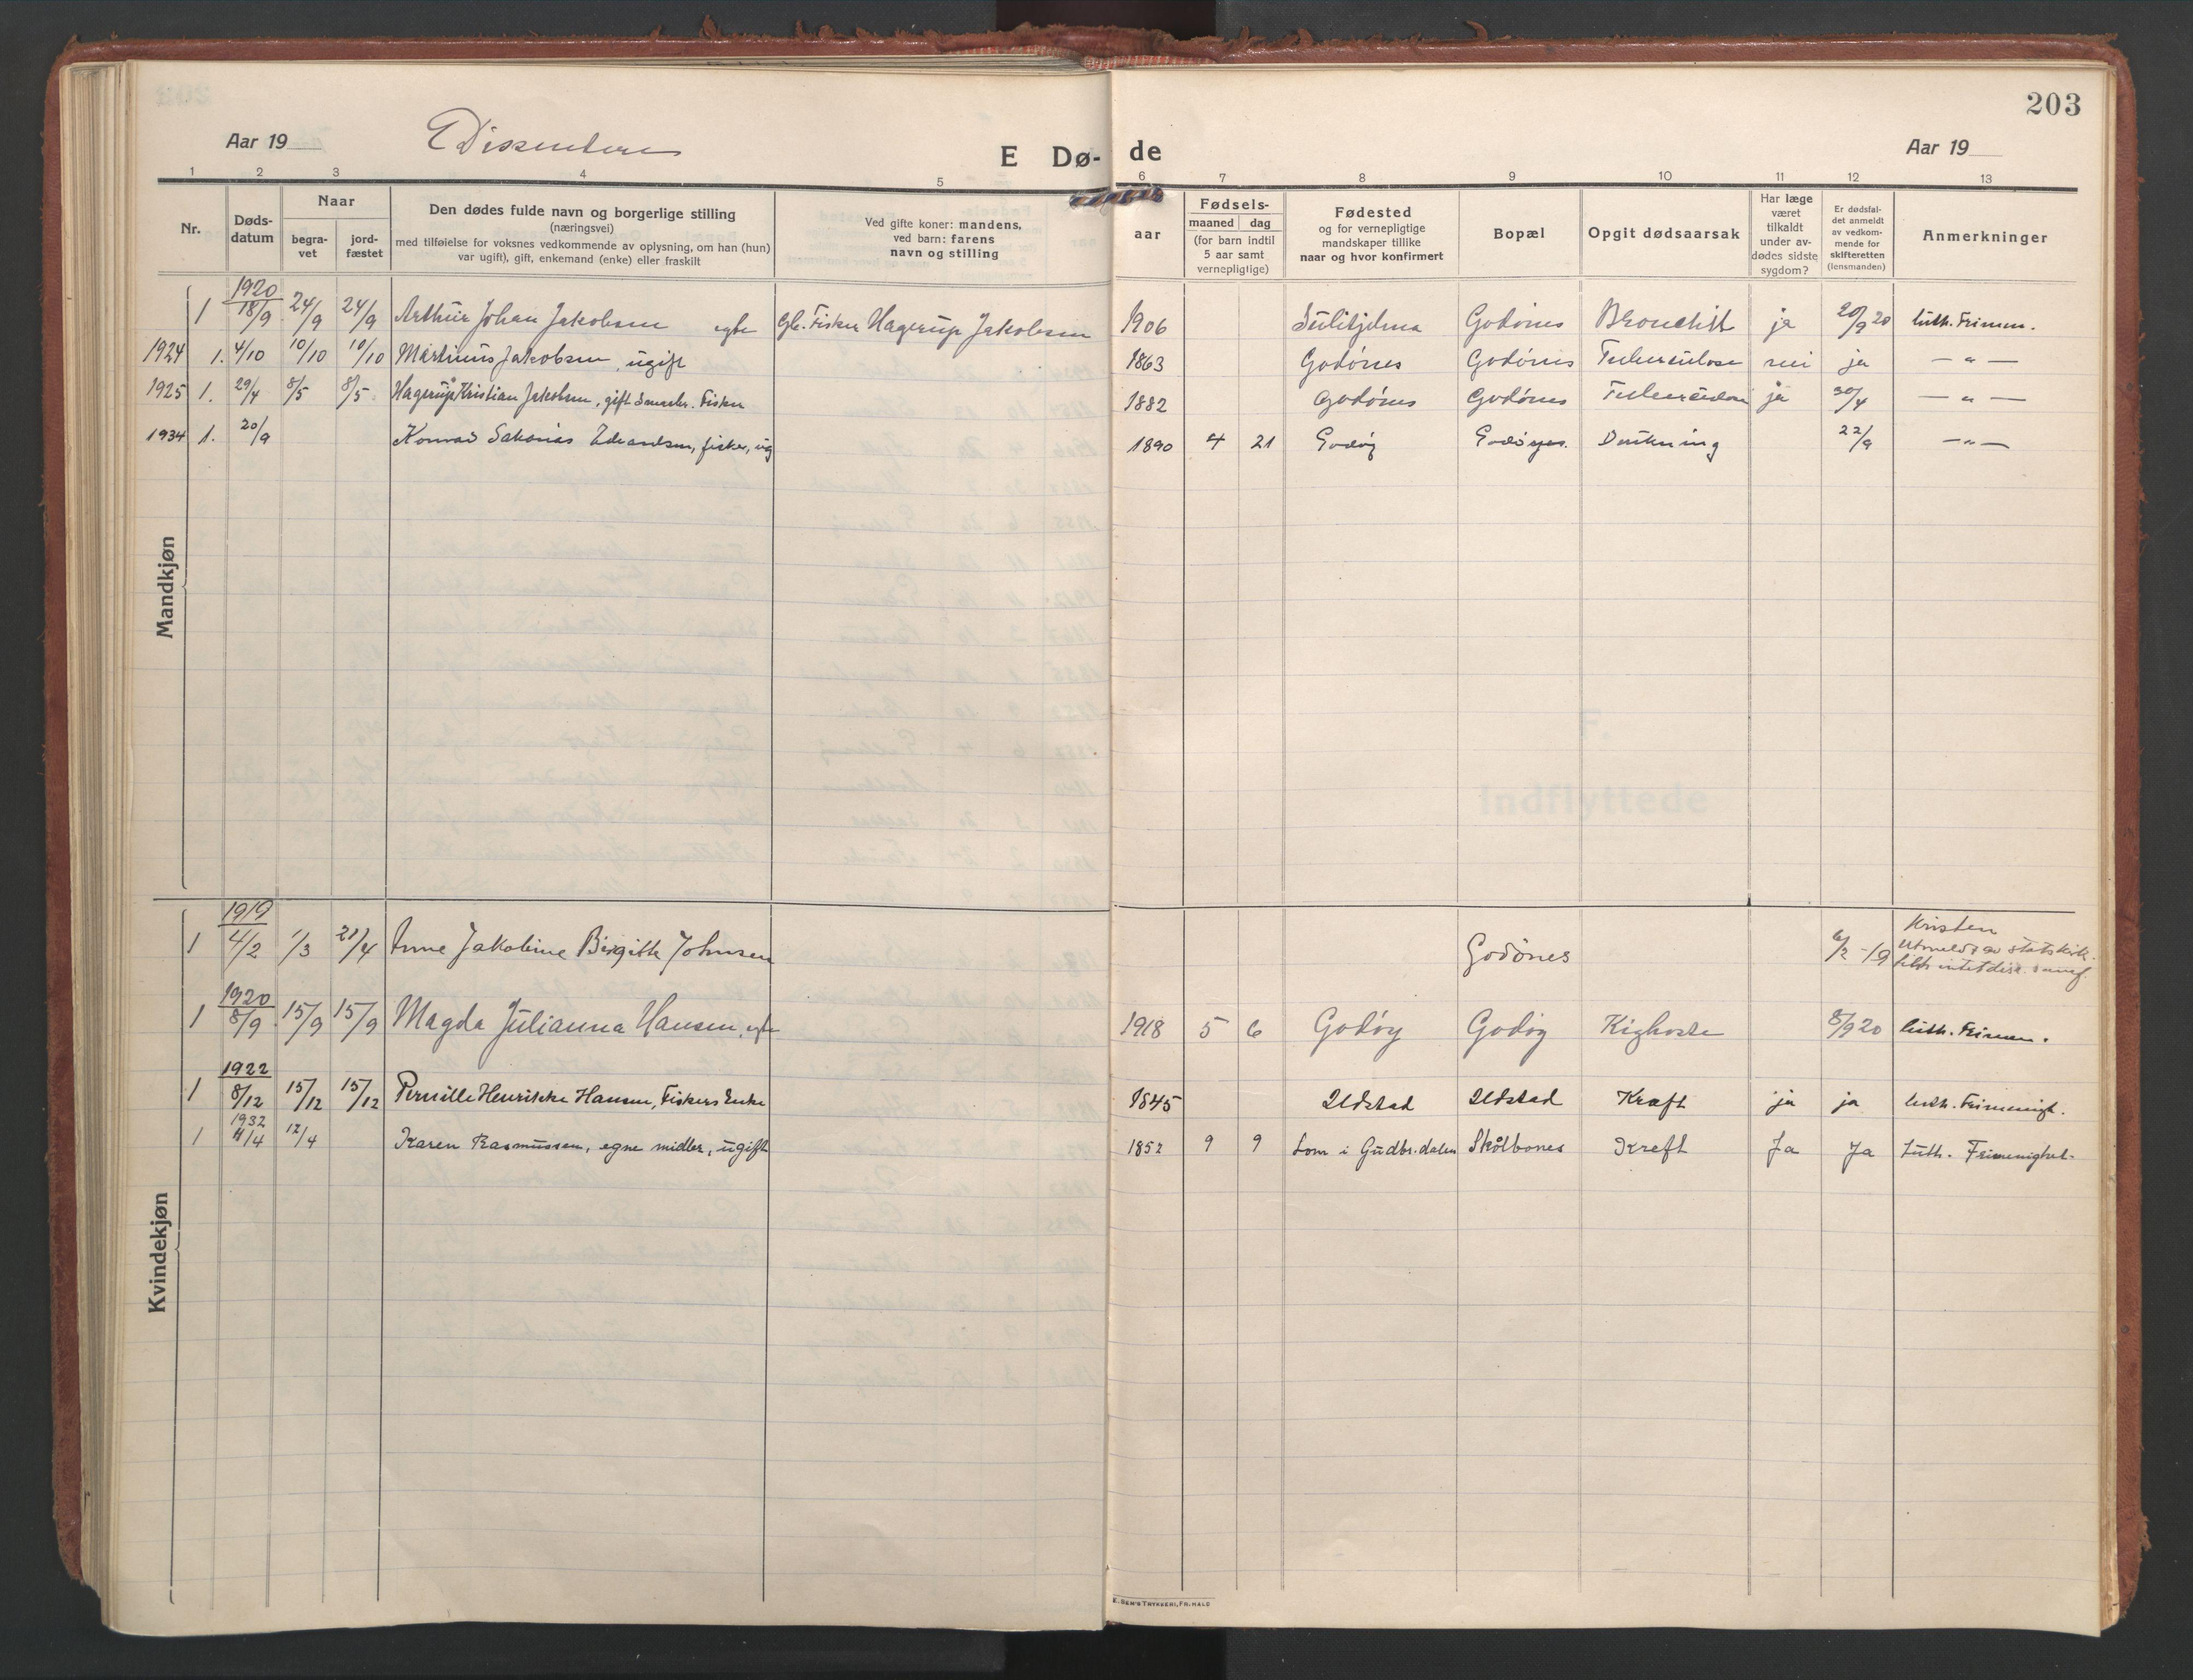 SAT, Ministerialprotokoller, klokkerbøker og fødselsregistre - Nordland, 804/L0086: Ministerialbok nr. 804A07, 1916-1935, s. 203